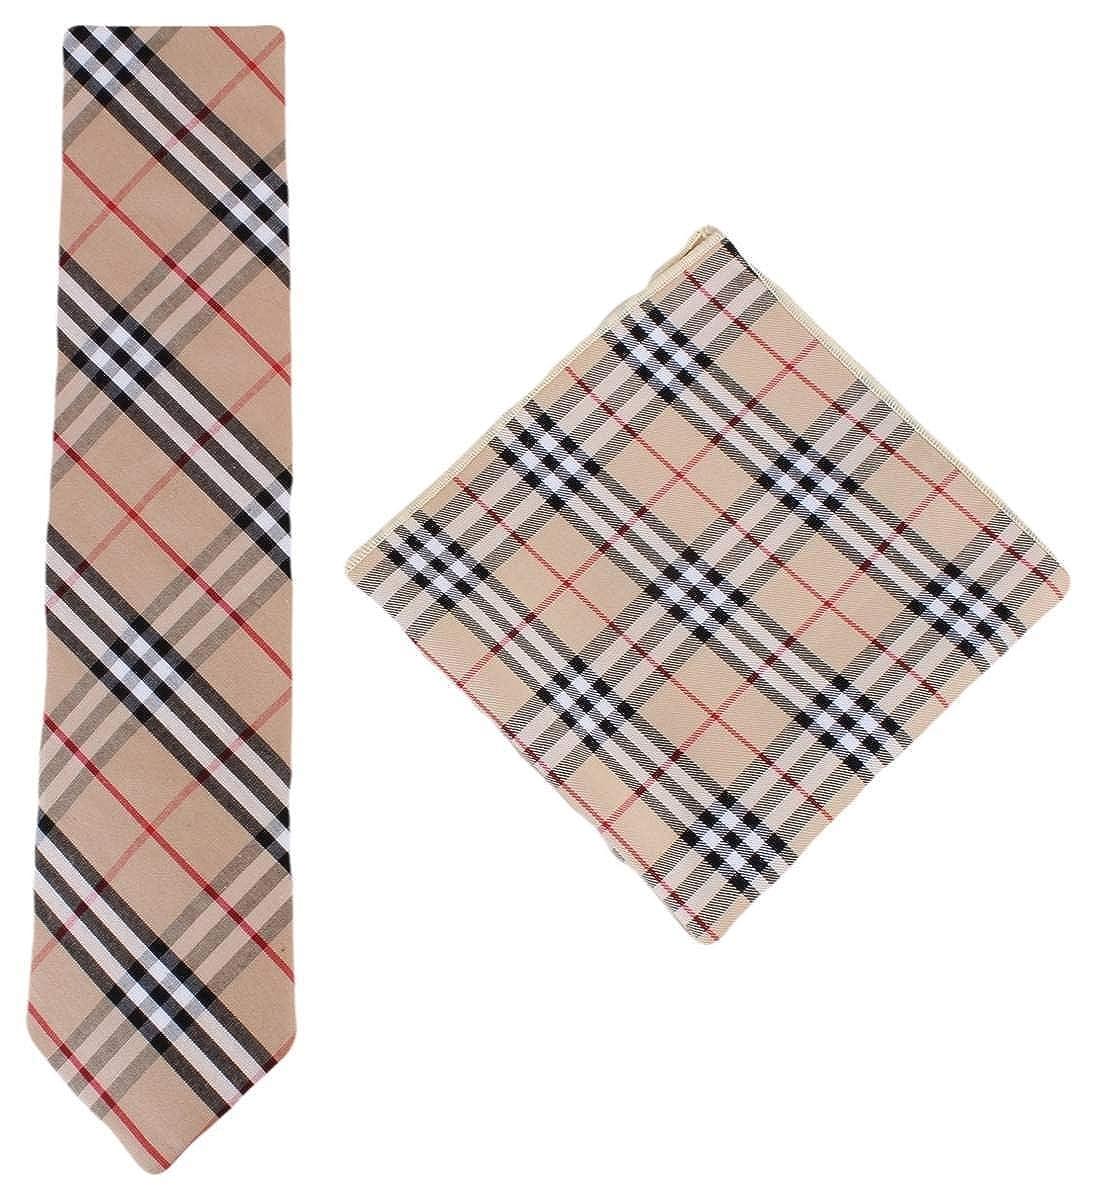 Knightsbridge Neckwear Mens Check Cotton Tie and Pocket Square Set Beige//Black//Red